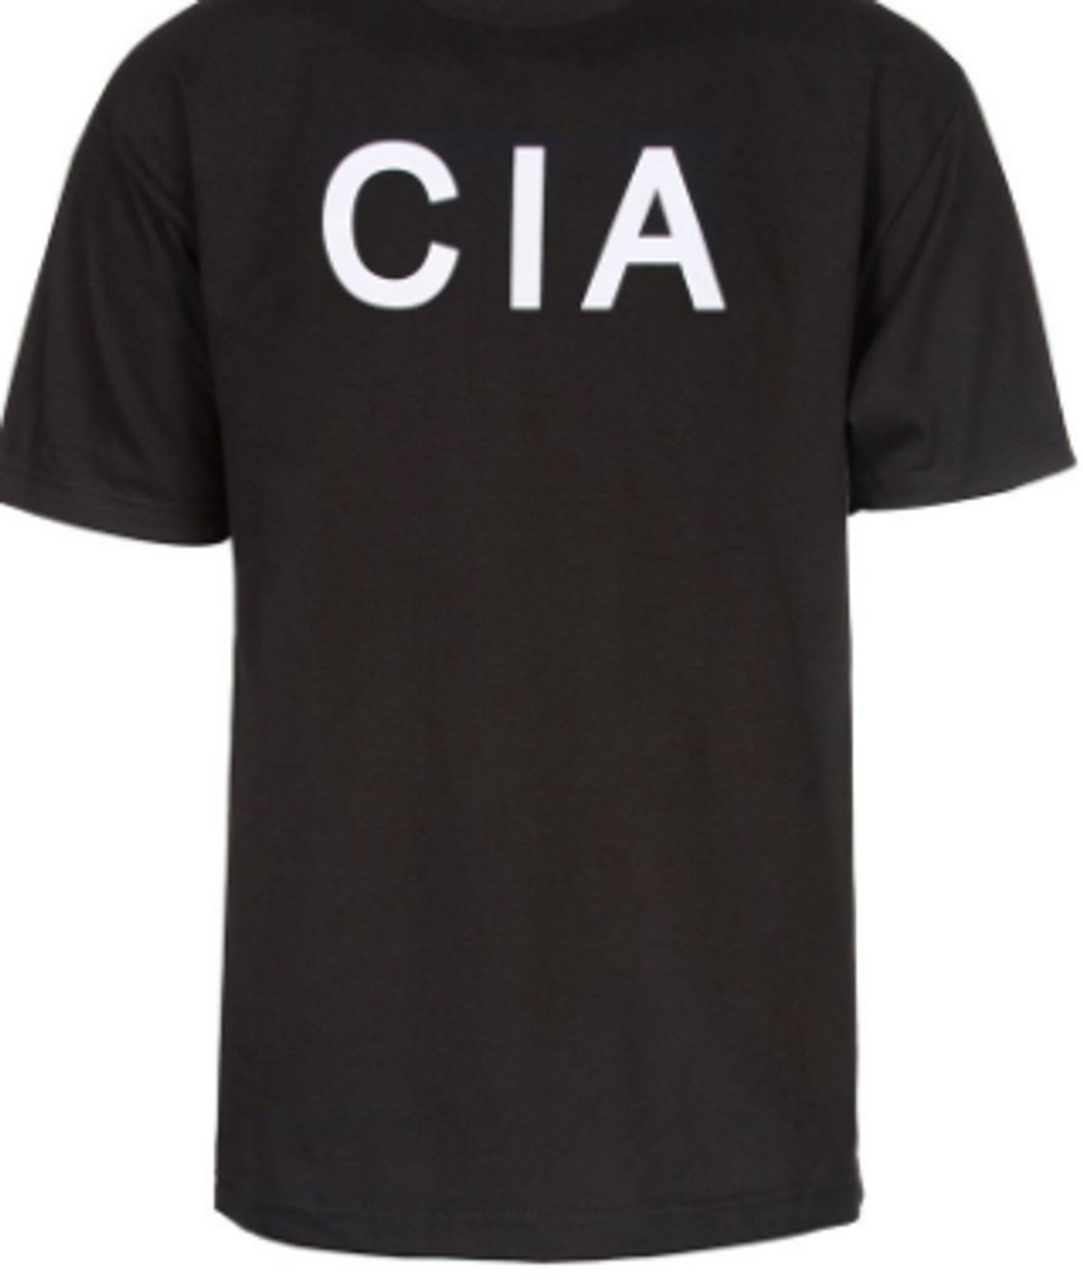 Parklands CIA T-Shirt